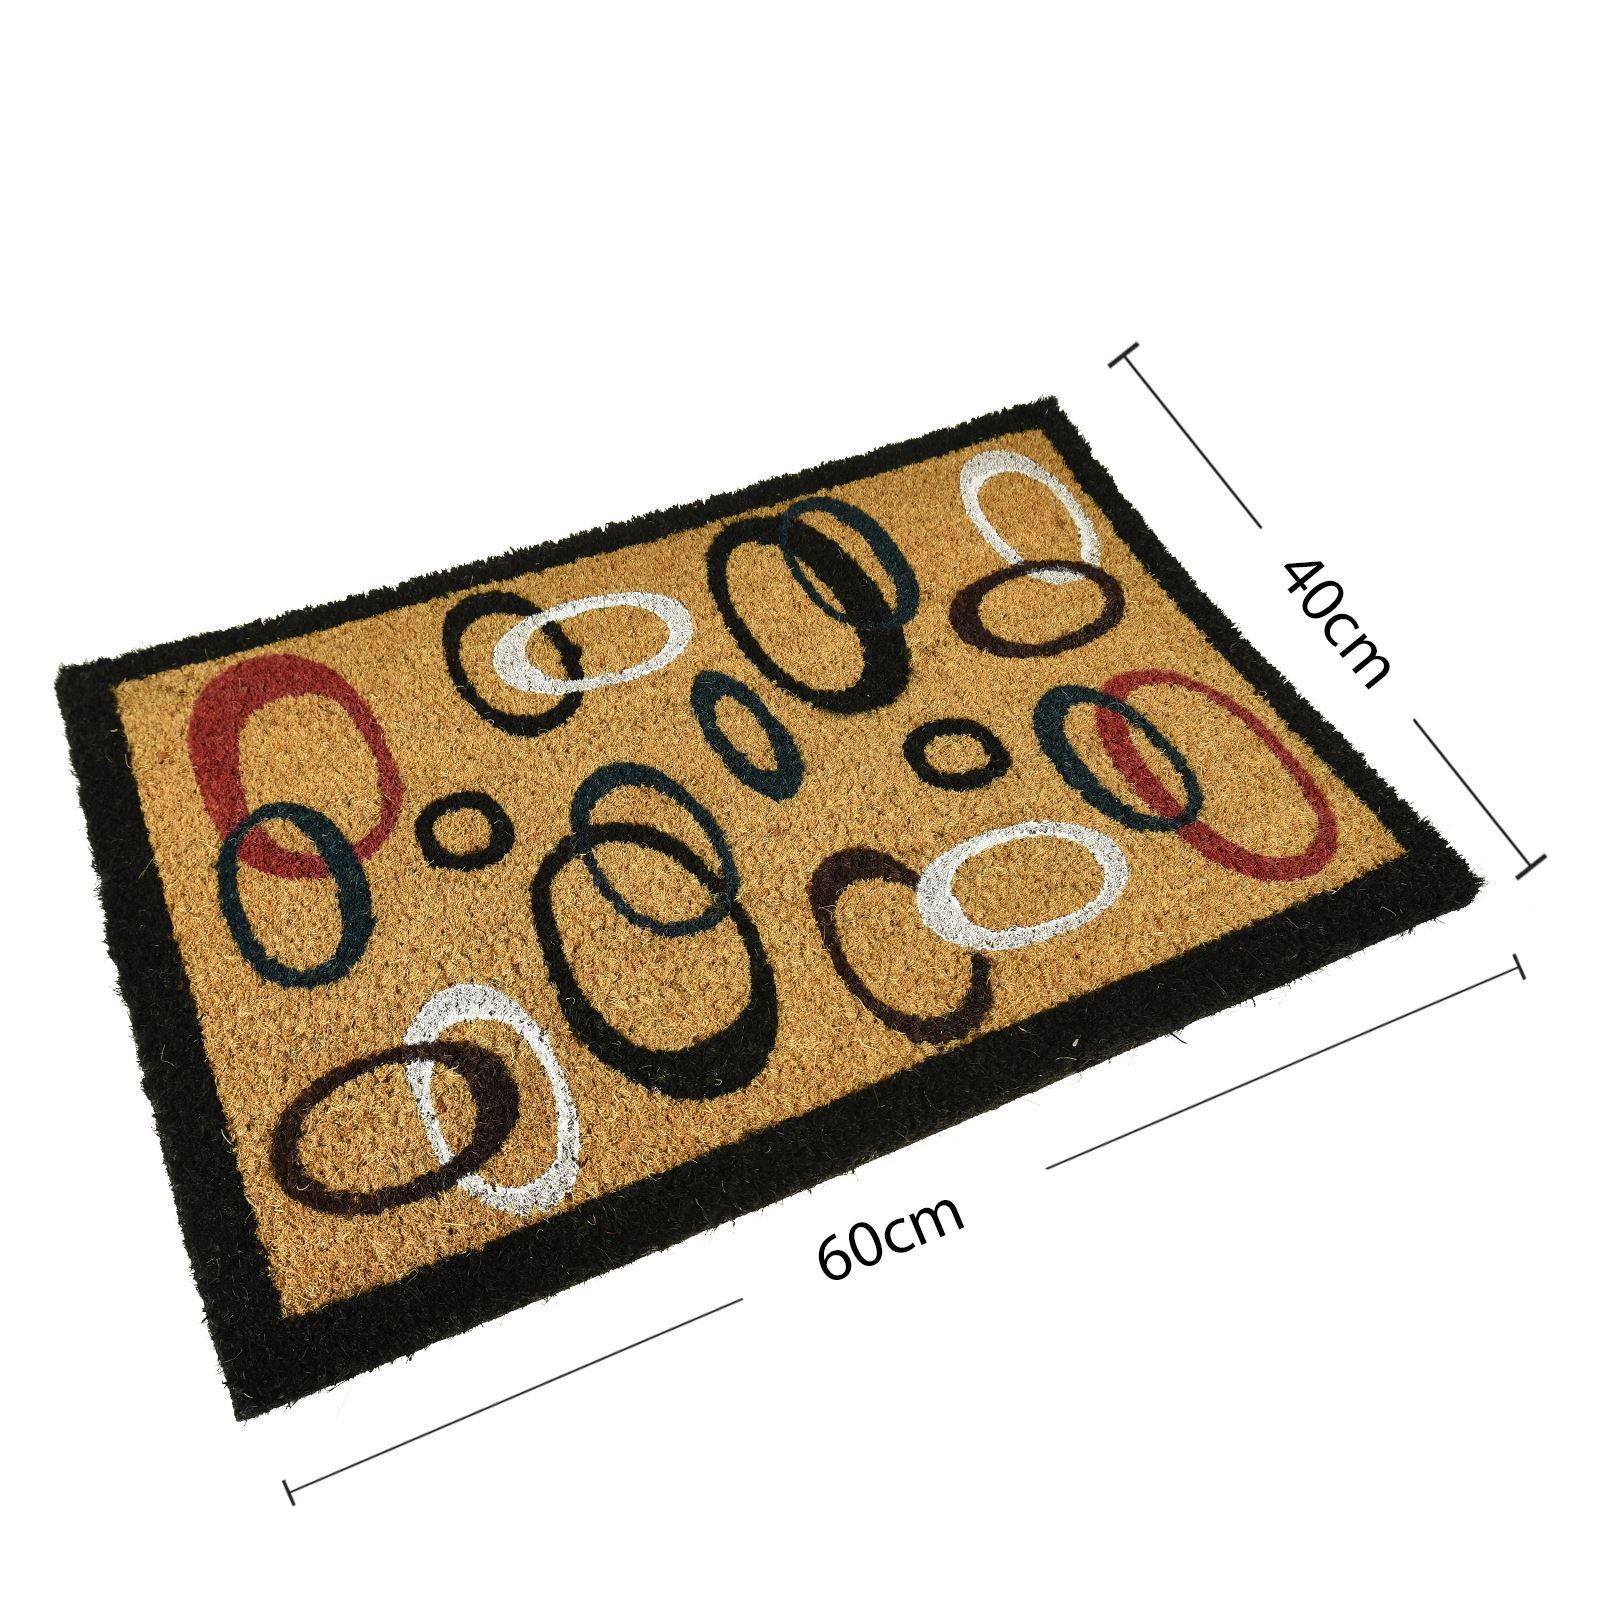 Plain-Non-Slip-Door-Mat-Tough-Natural-Coir-PVC-Back-Welcome-Doormat-40-x-60cm miniatura 32